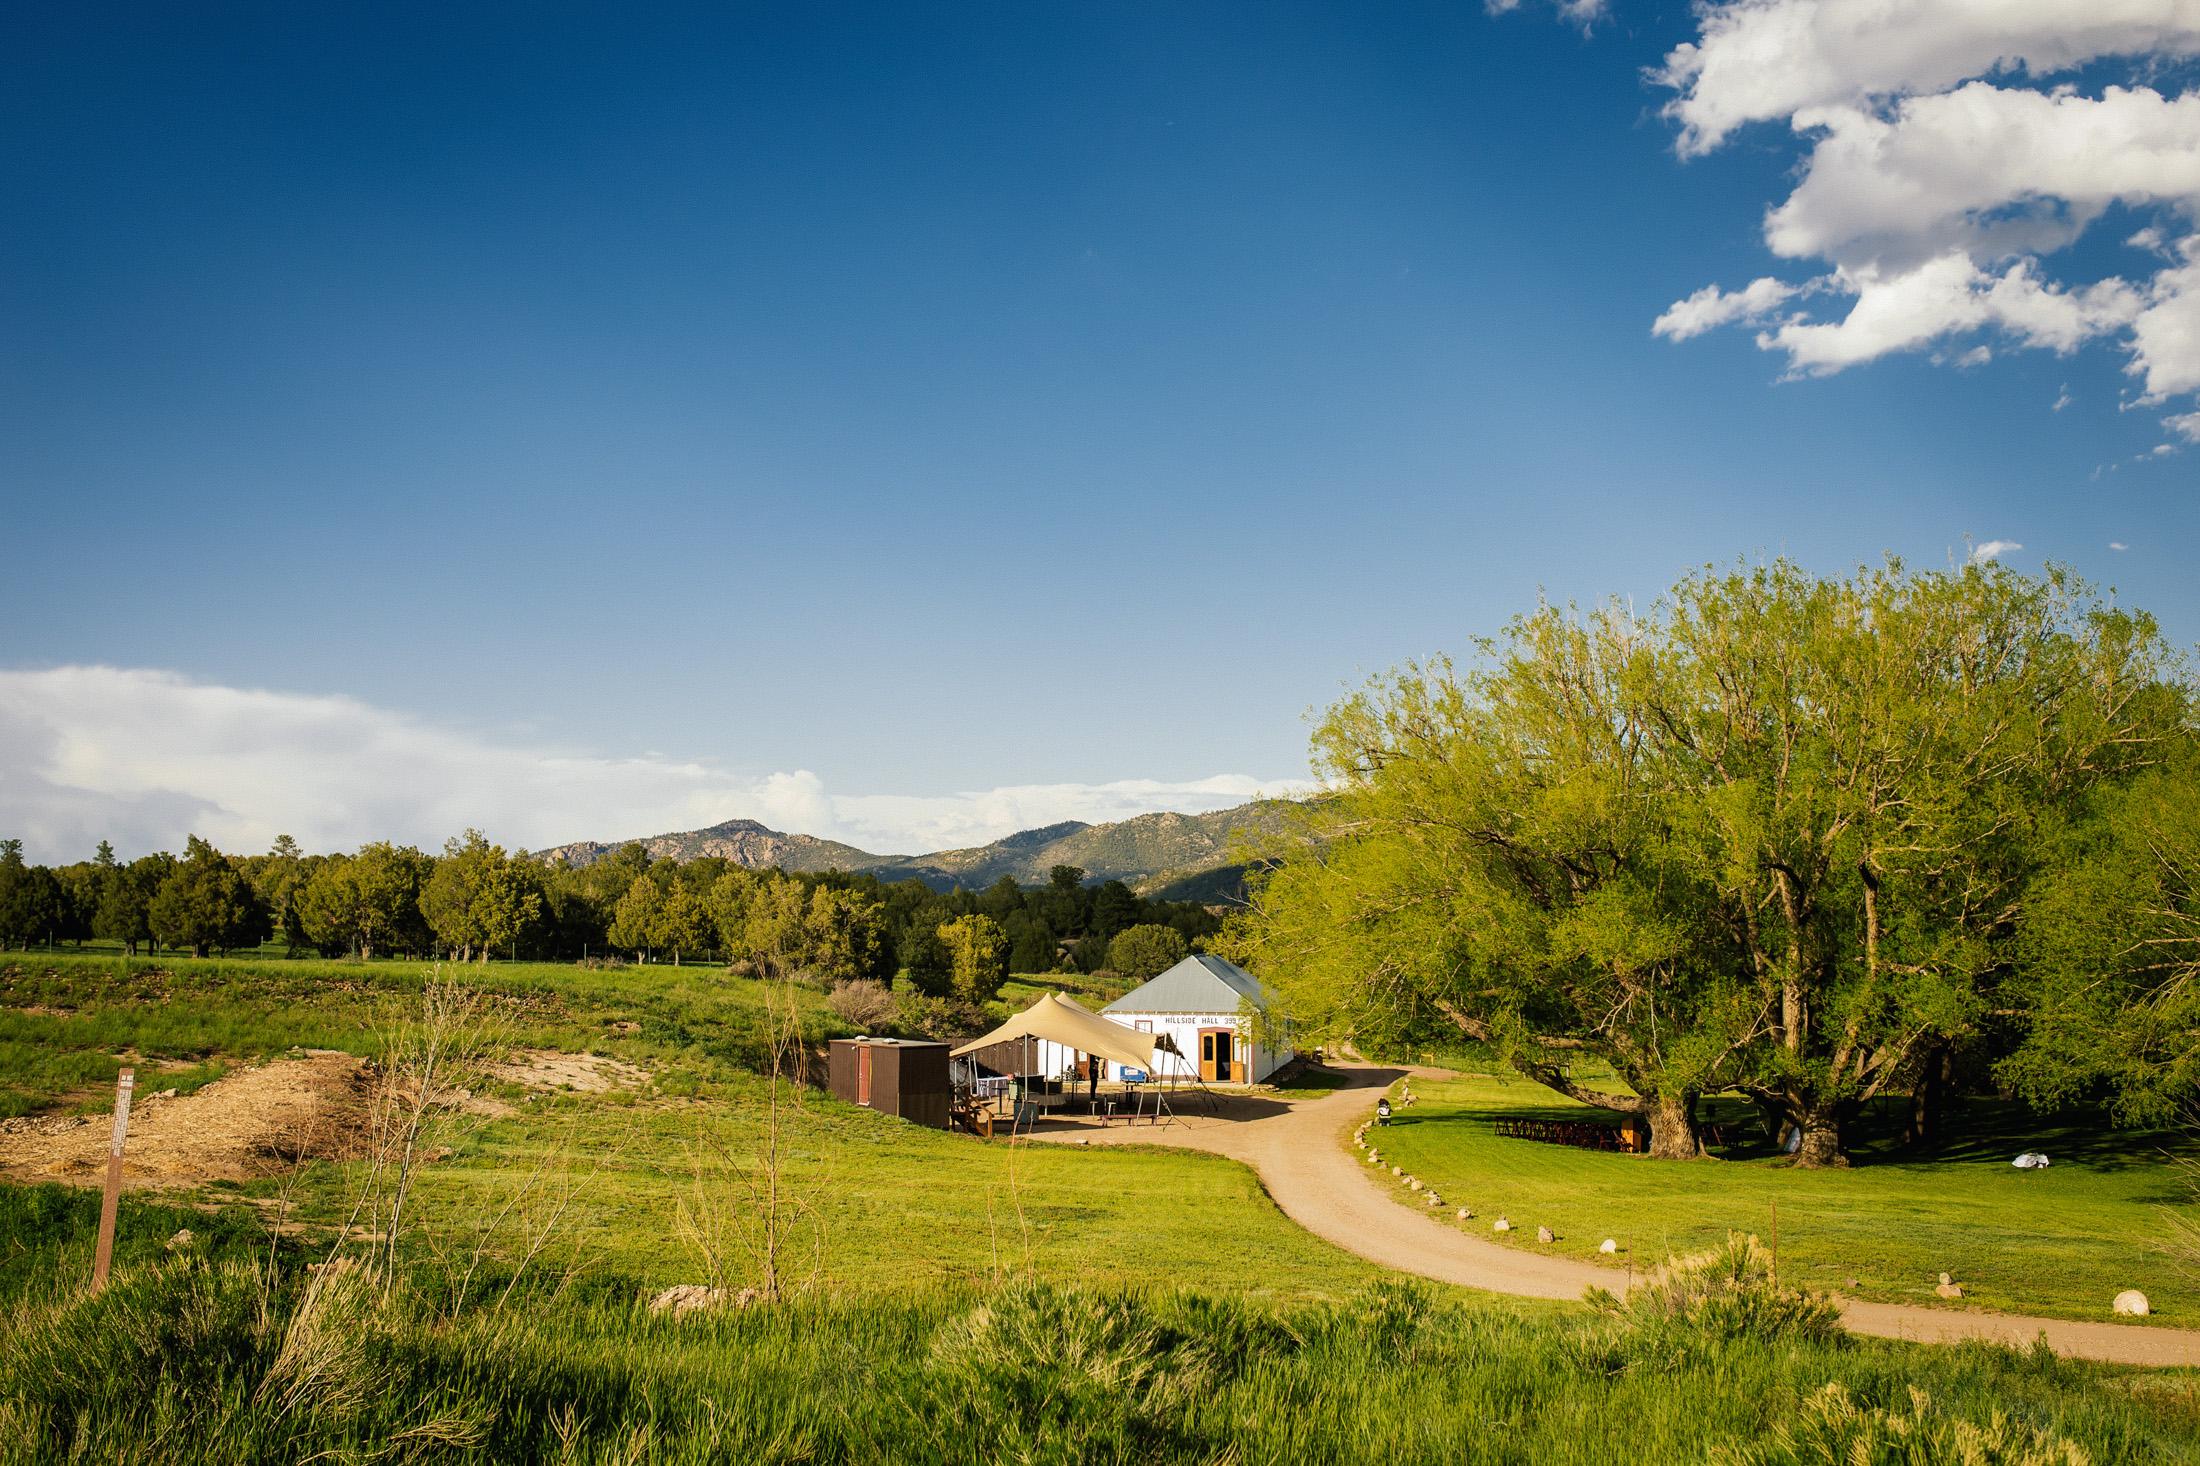 Willow Vale Events location in Hillside, Colorado